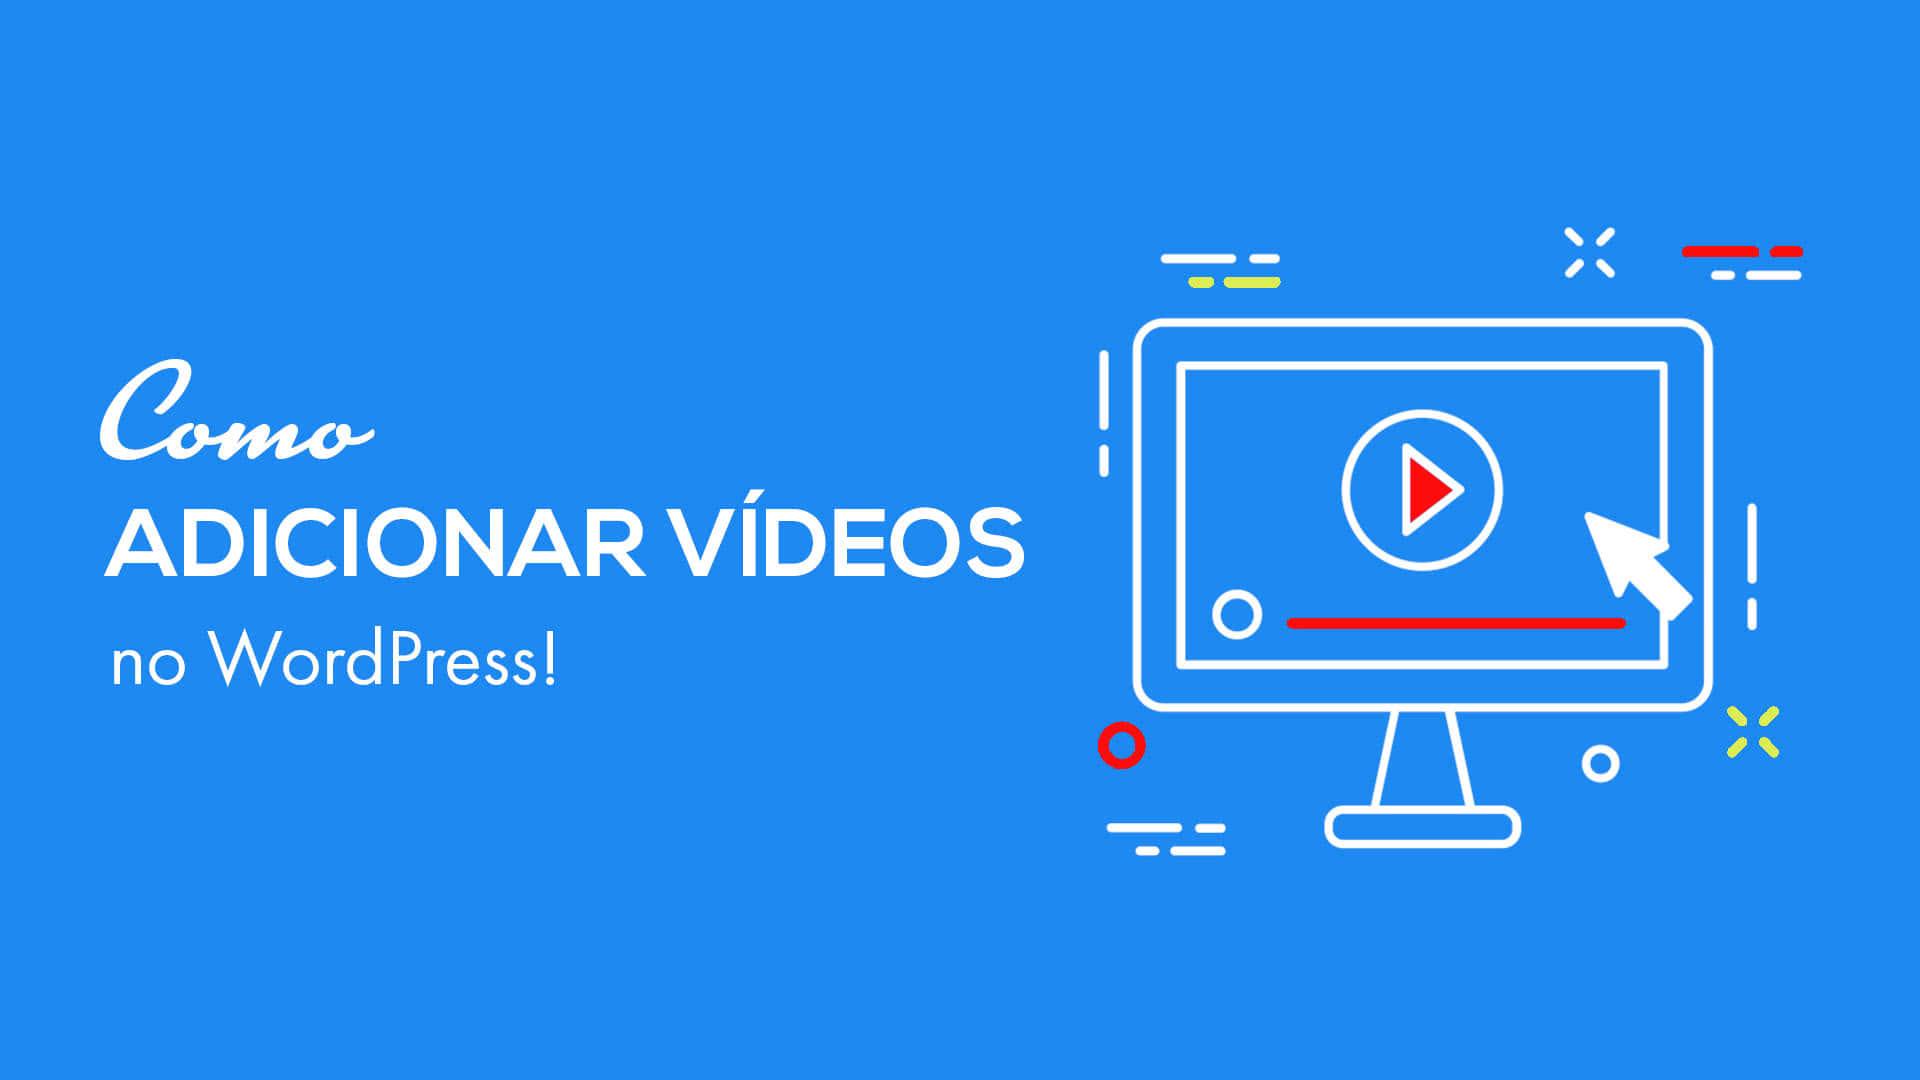 Como adicionar vídeos nos posts do wordpress